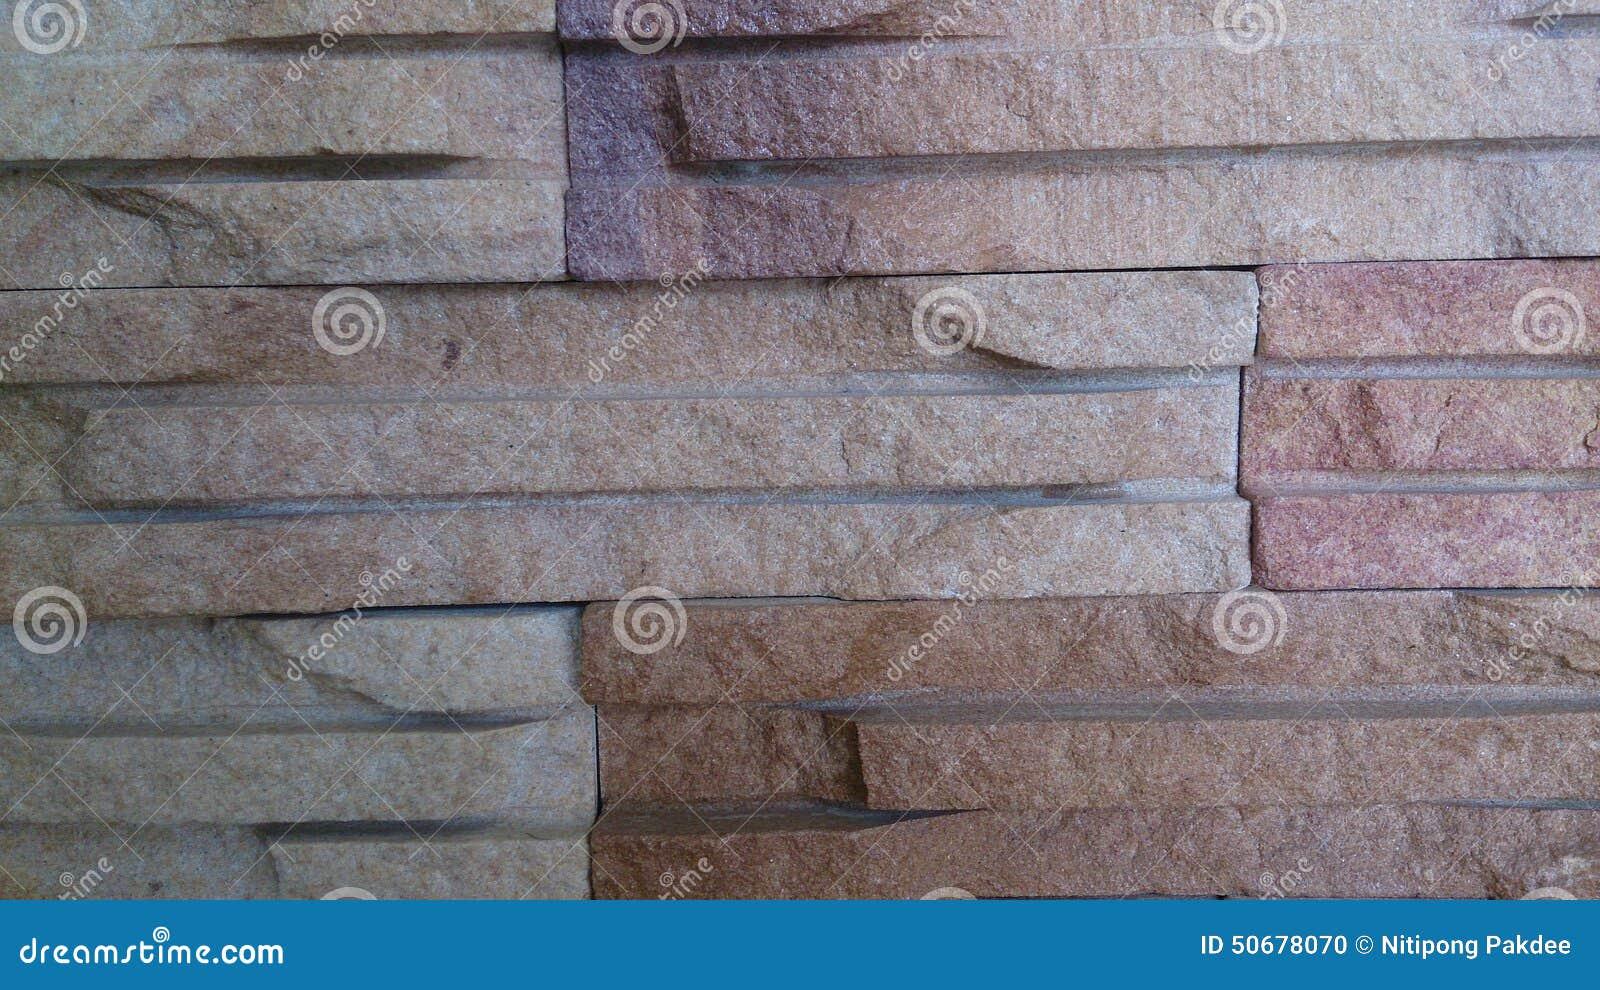 Download 水泥和石头难倒纹理墙纸和背景 库存照片. 图片 包括有 酿造, 年龄, 具体, 详细资料, 拱道, 水泥 - 50678070